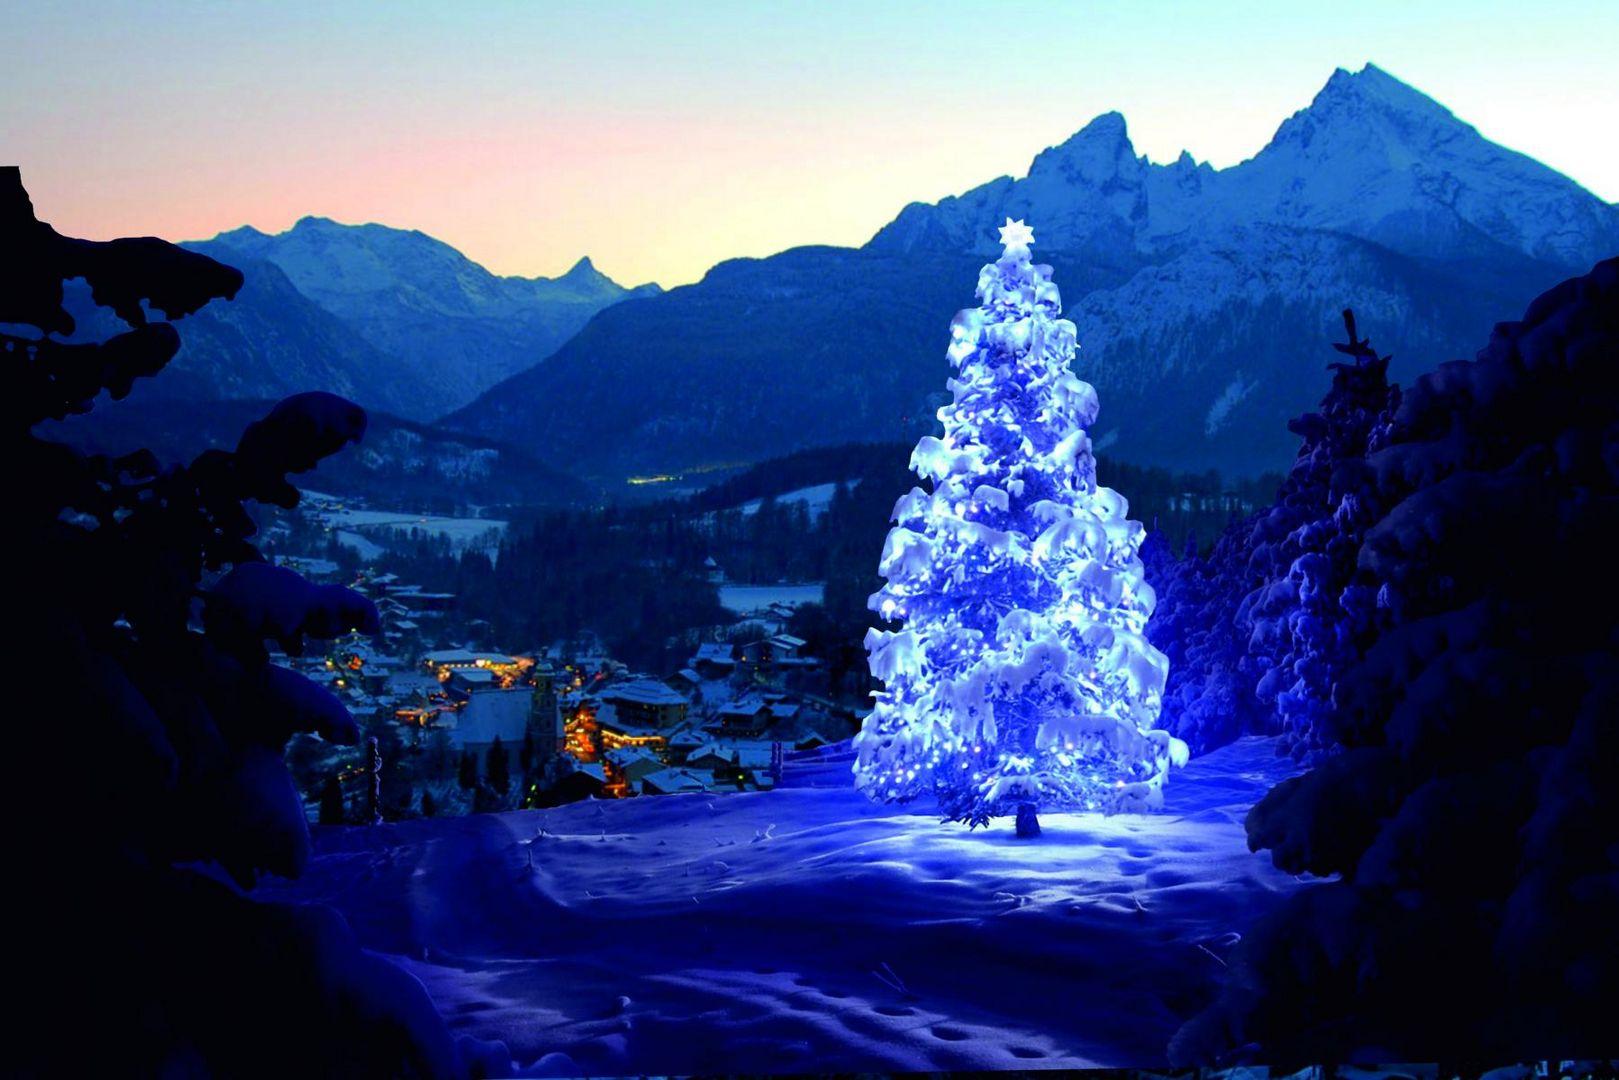 Berchtesgaden Weihnachten 2015 Foto & Bild   bearbeitungs ...